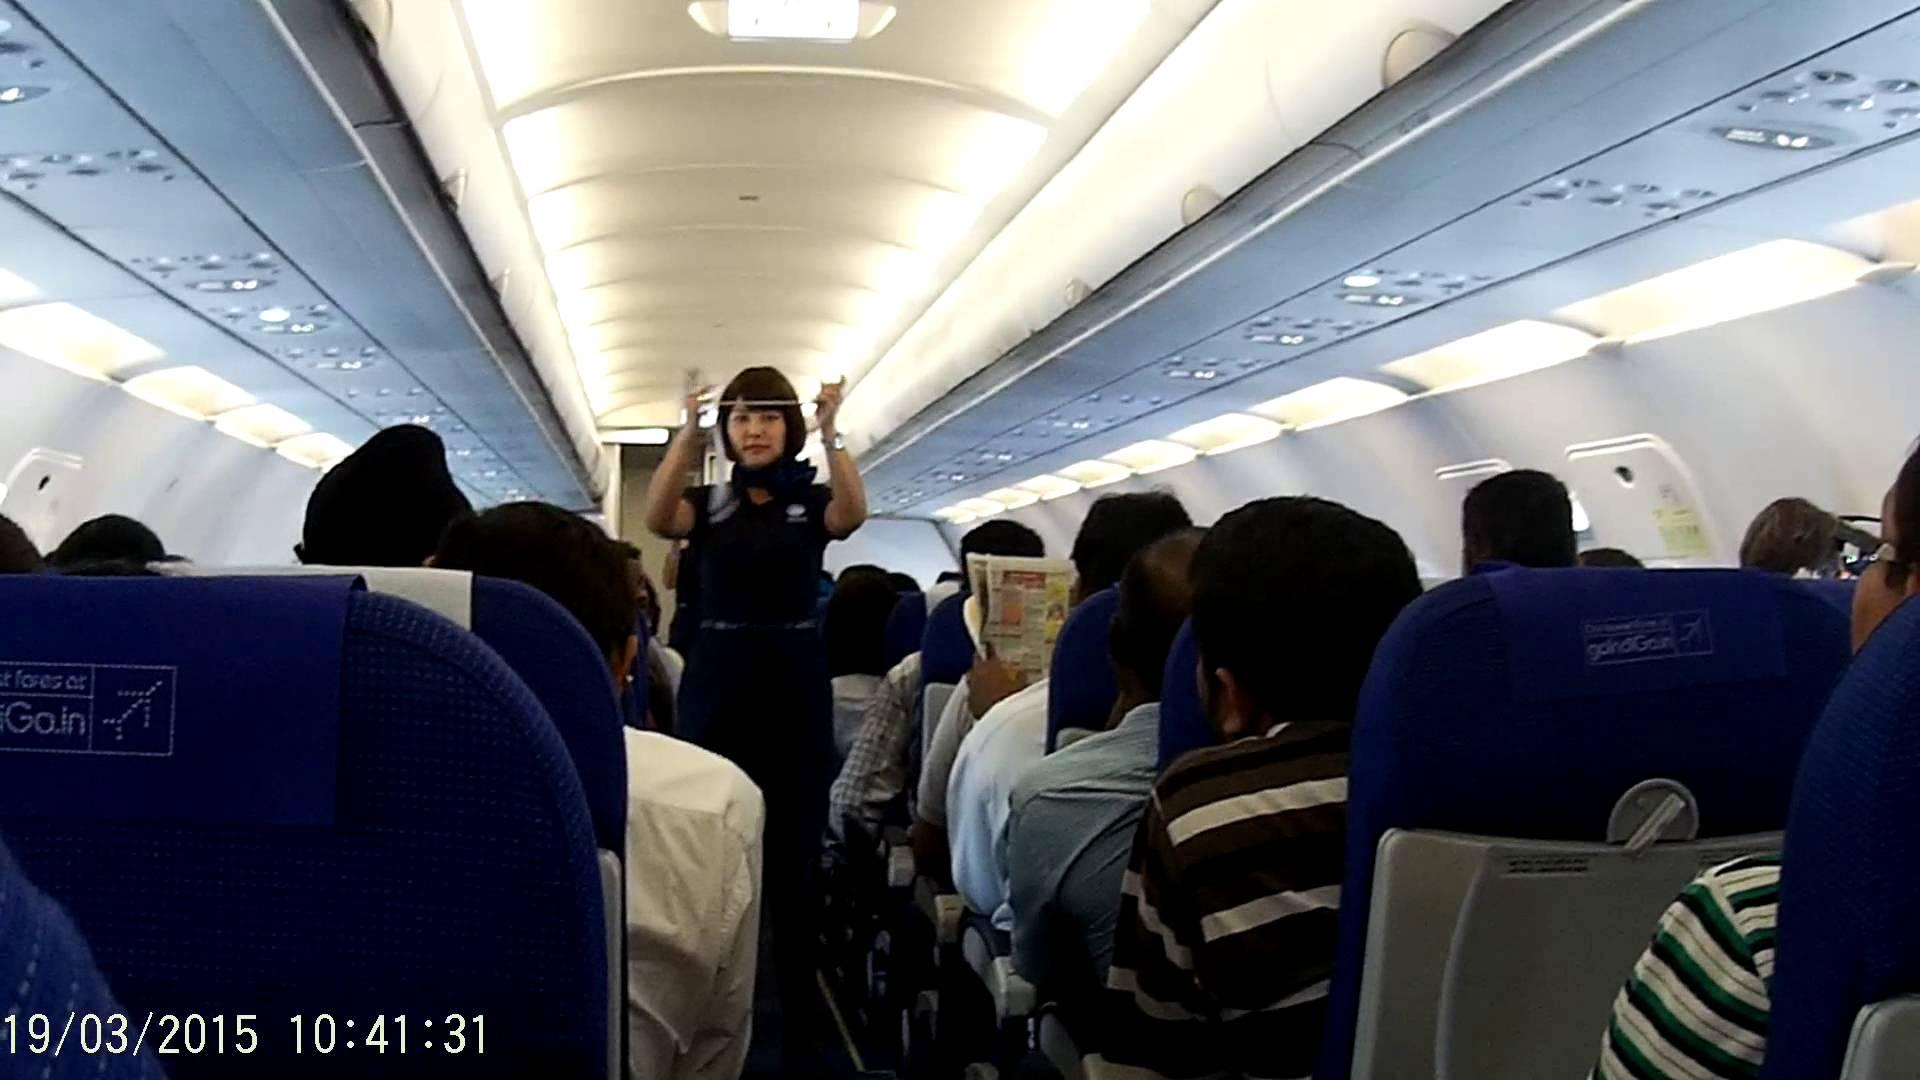 Indigo Flight Air Hostess Explaining Safety Demonstration Sj5000 Camera Video Chennai To Delhi